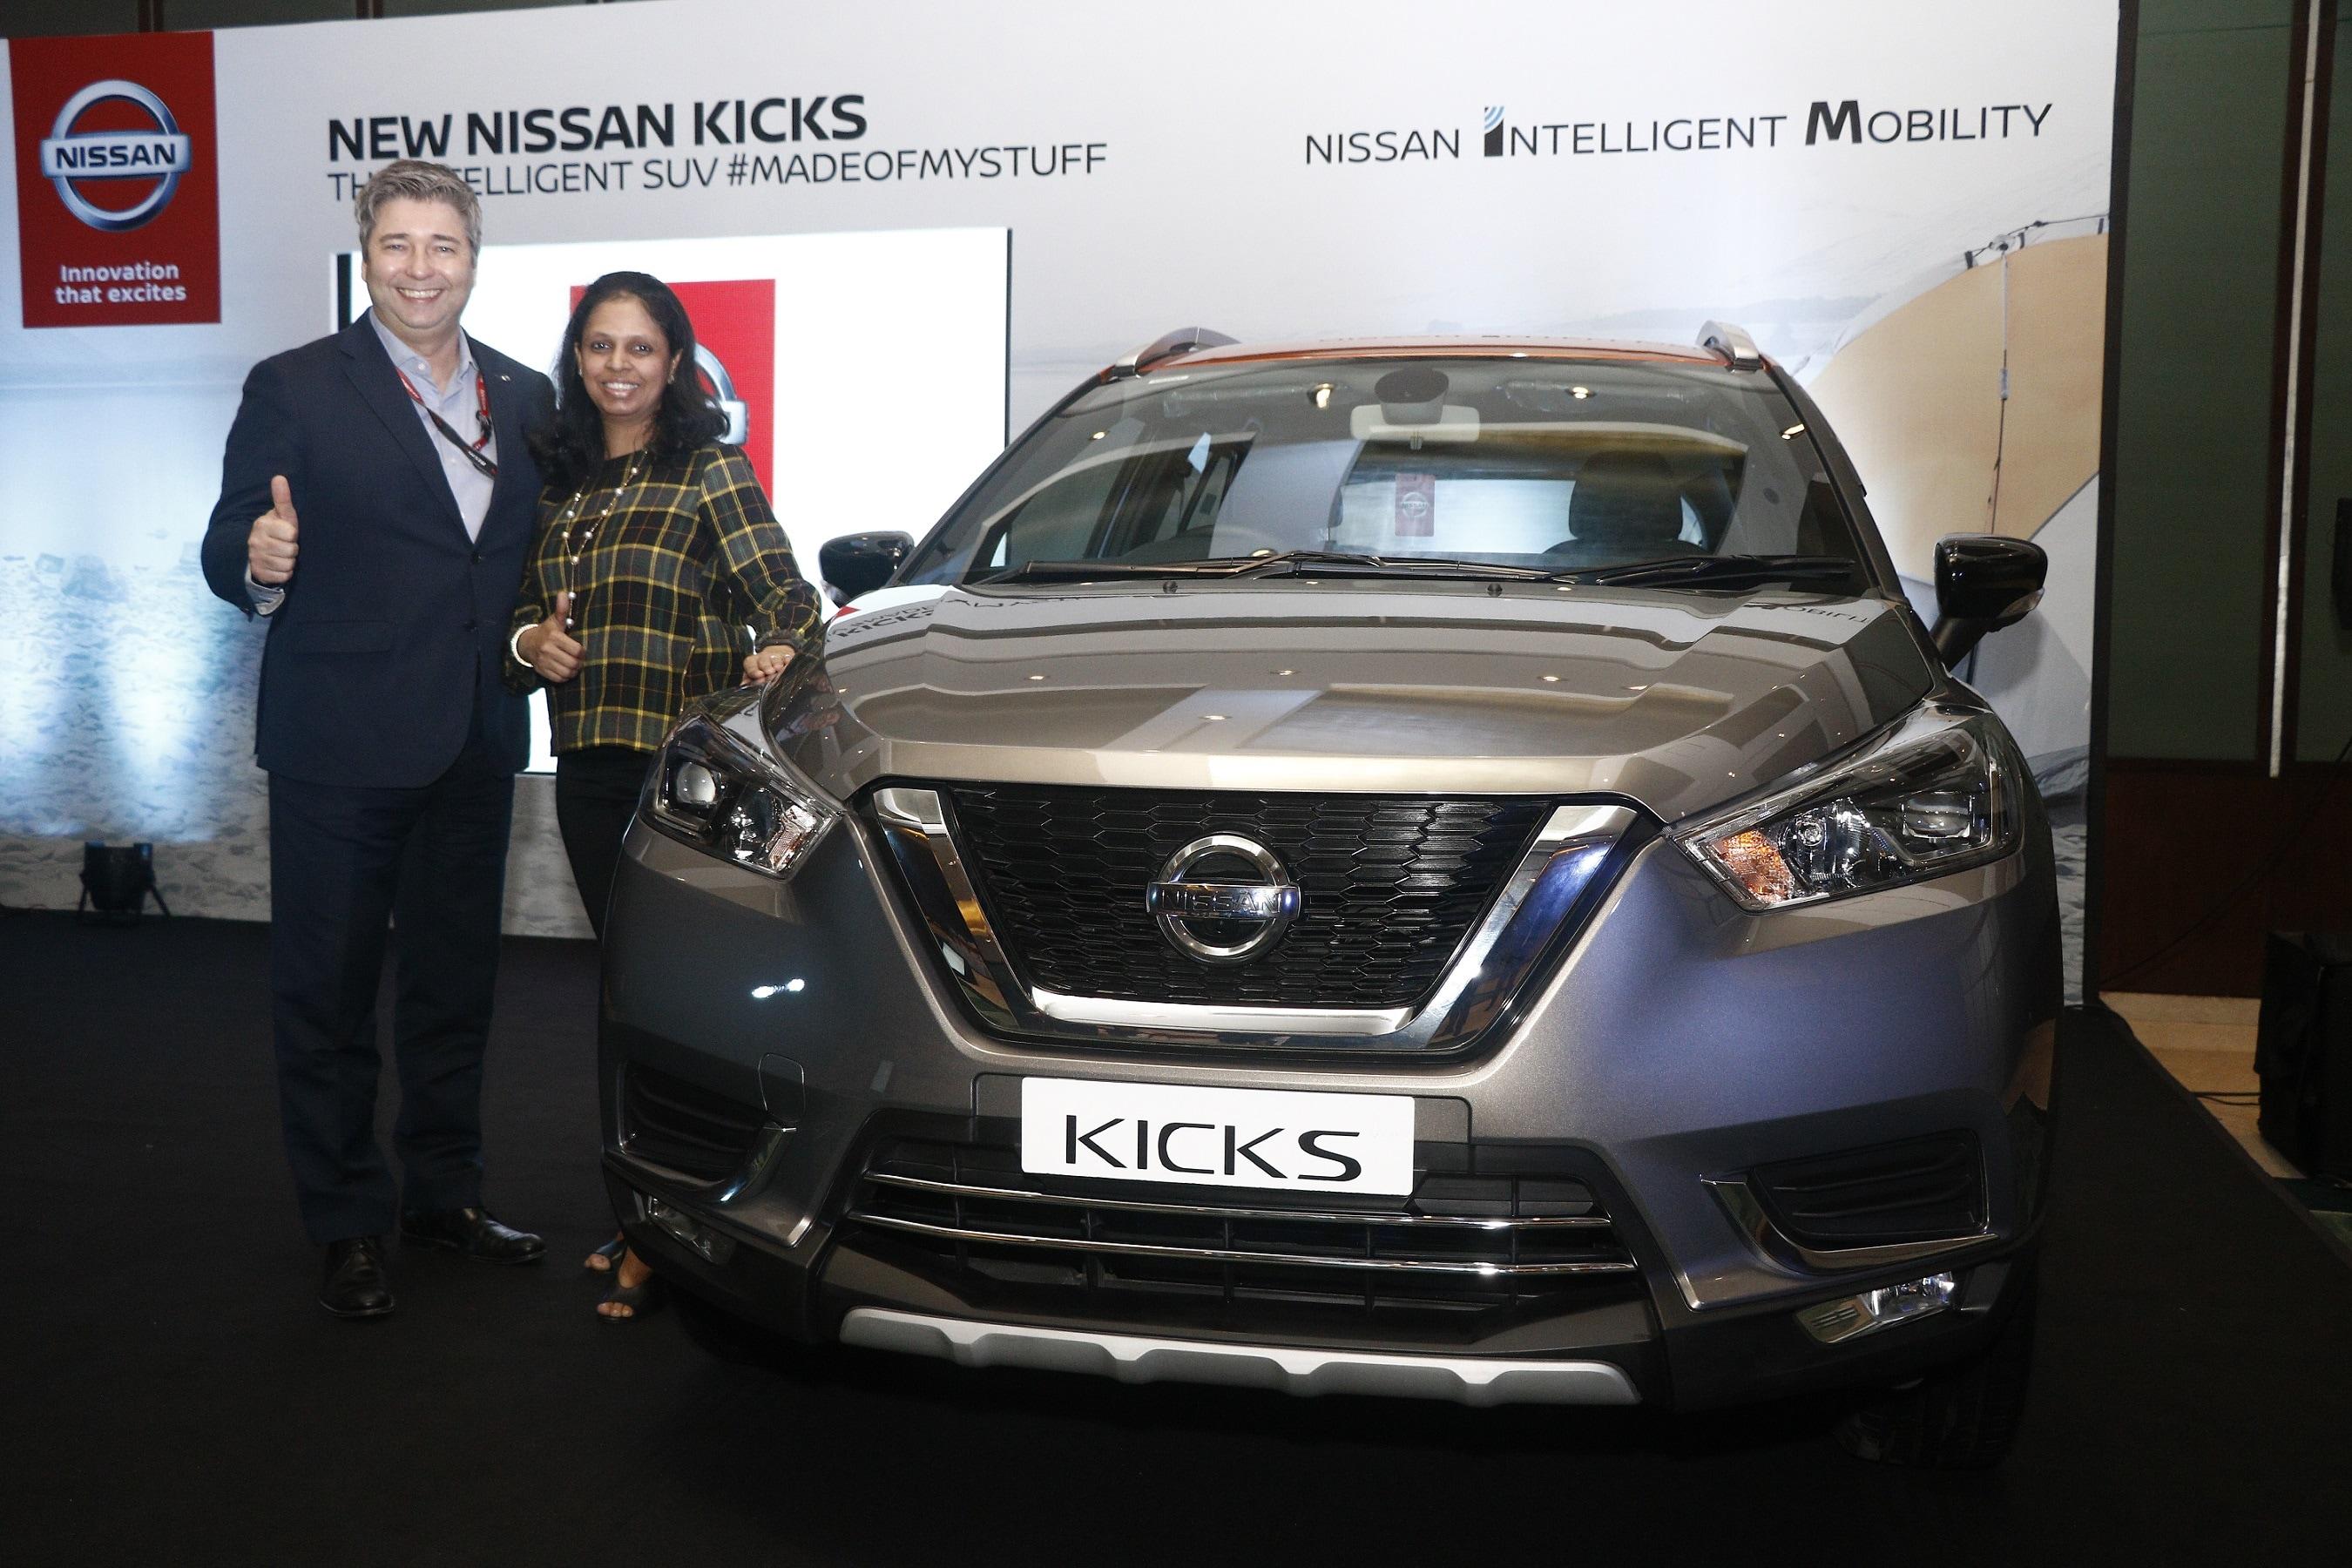 2019 Nissan Kicks এর দাম শুরু হচ্ছে 9.55 লক্ষ টাকা থেকে